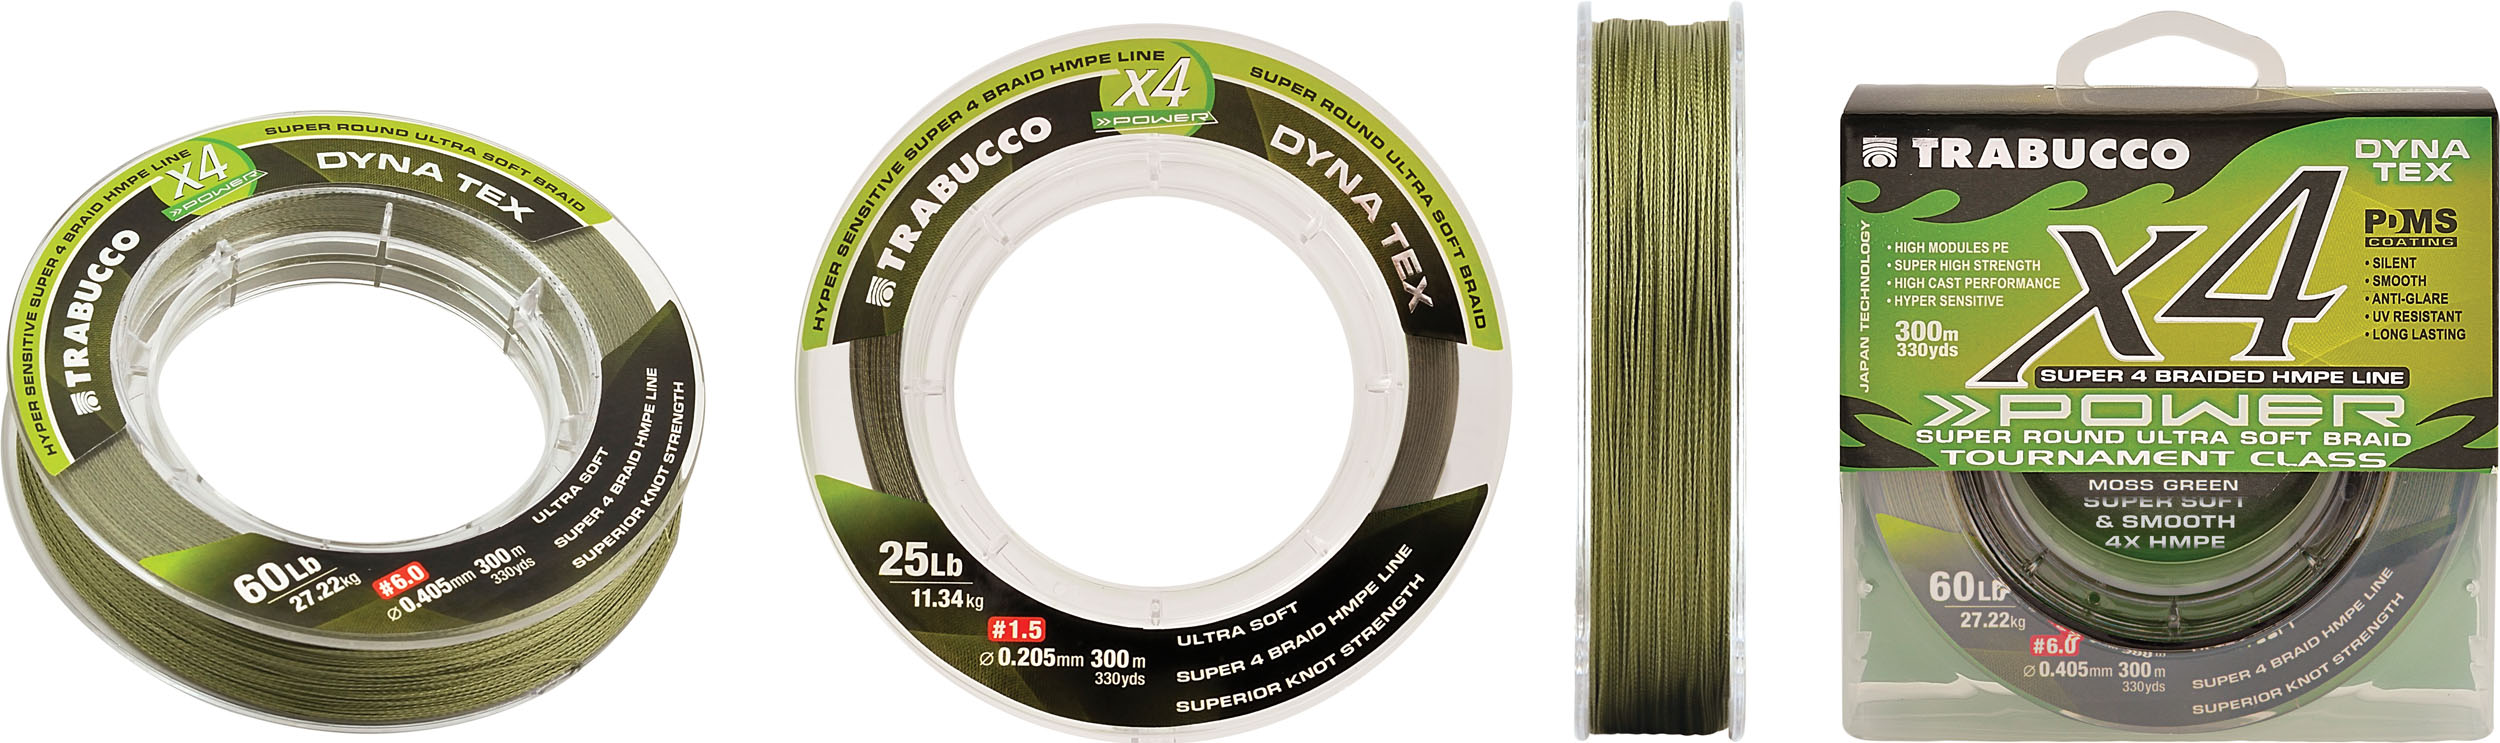 Trabucco Dyna Tex X4 Power 300m 0.435mm MOSS GREEN